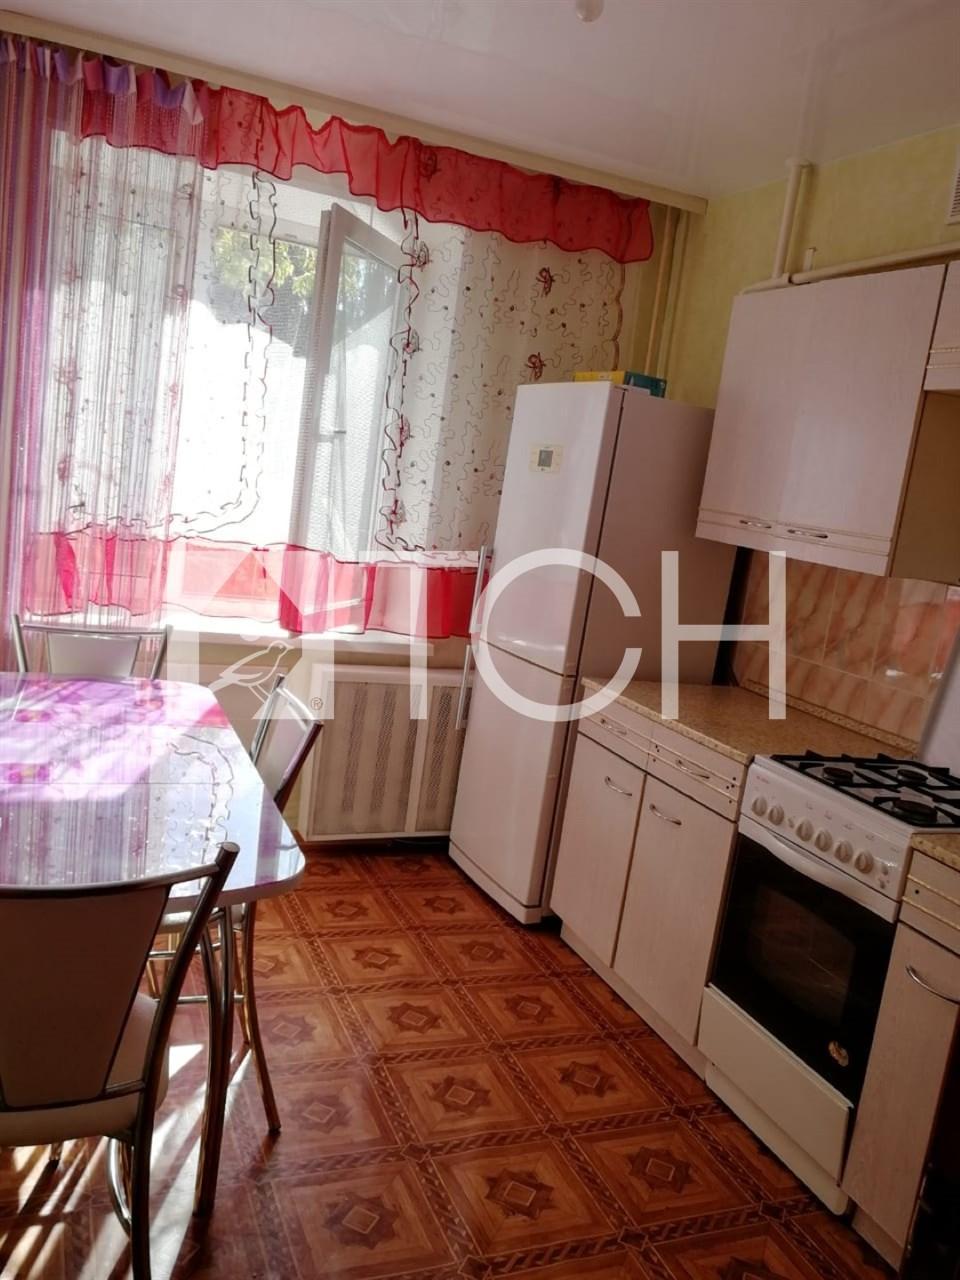 Квартира, 1 комната, 35 м² в Щелково 89261425000 купить 6